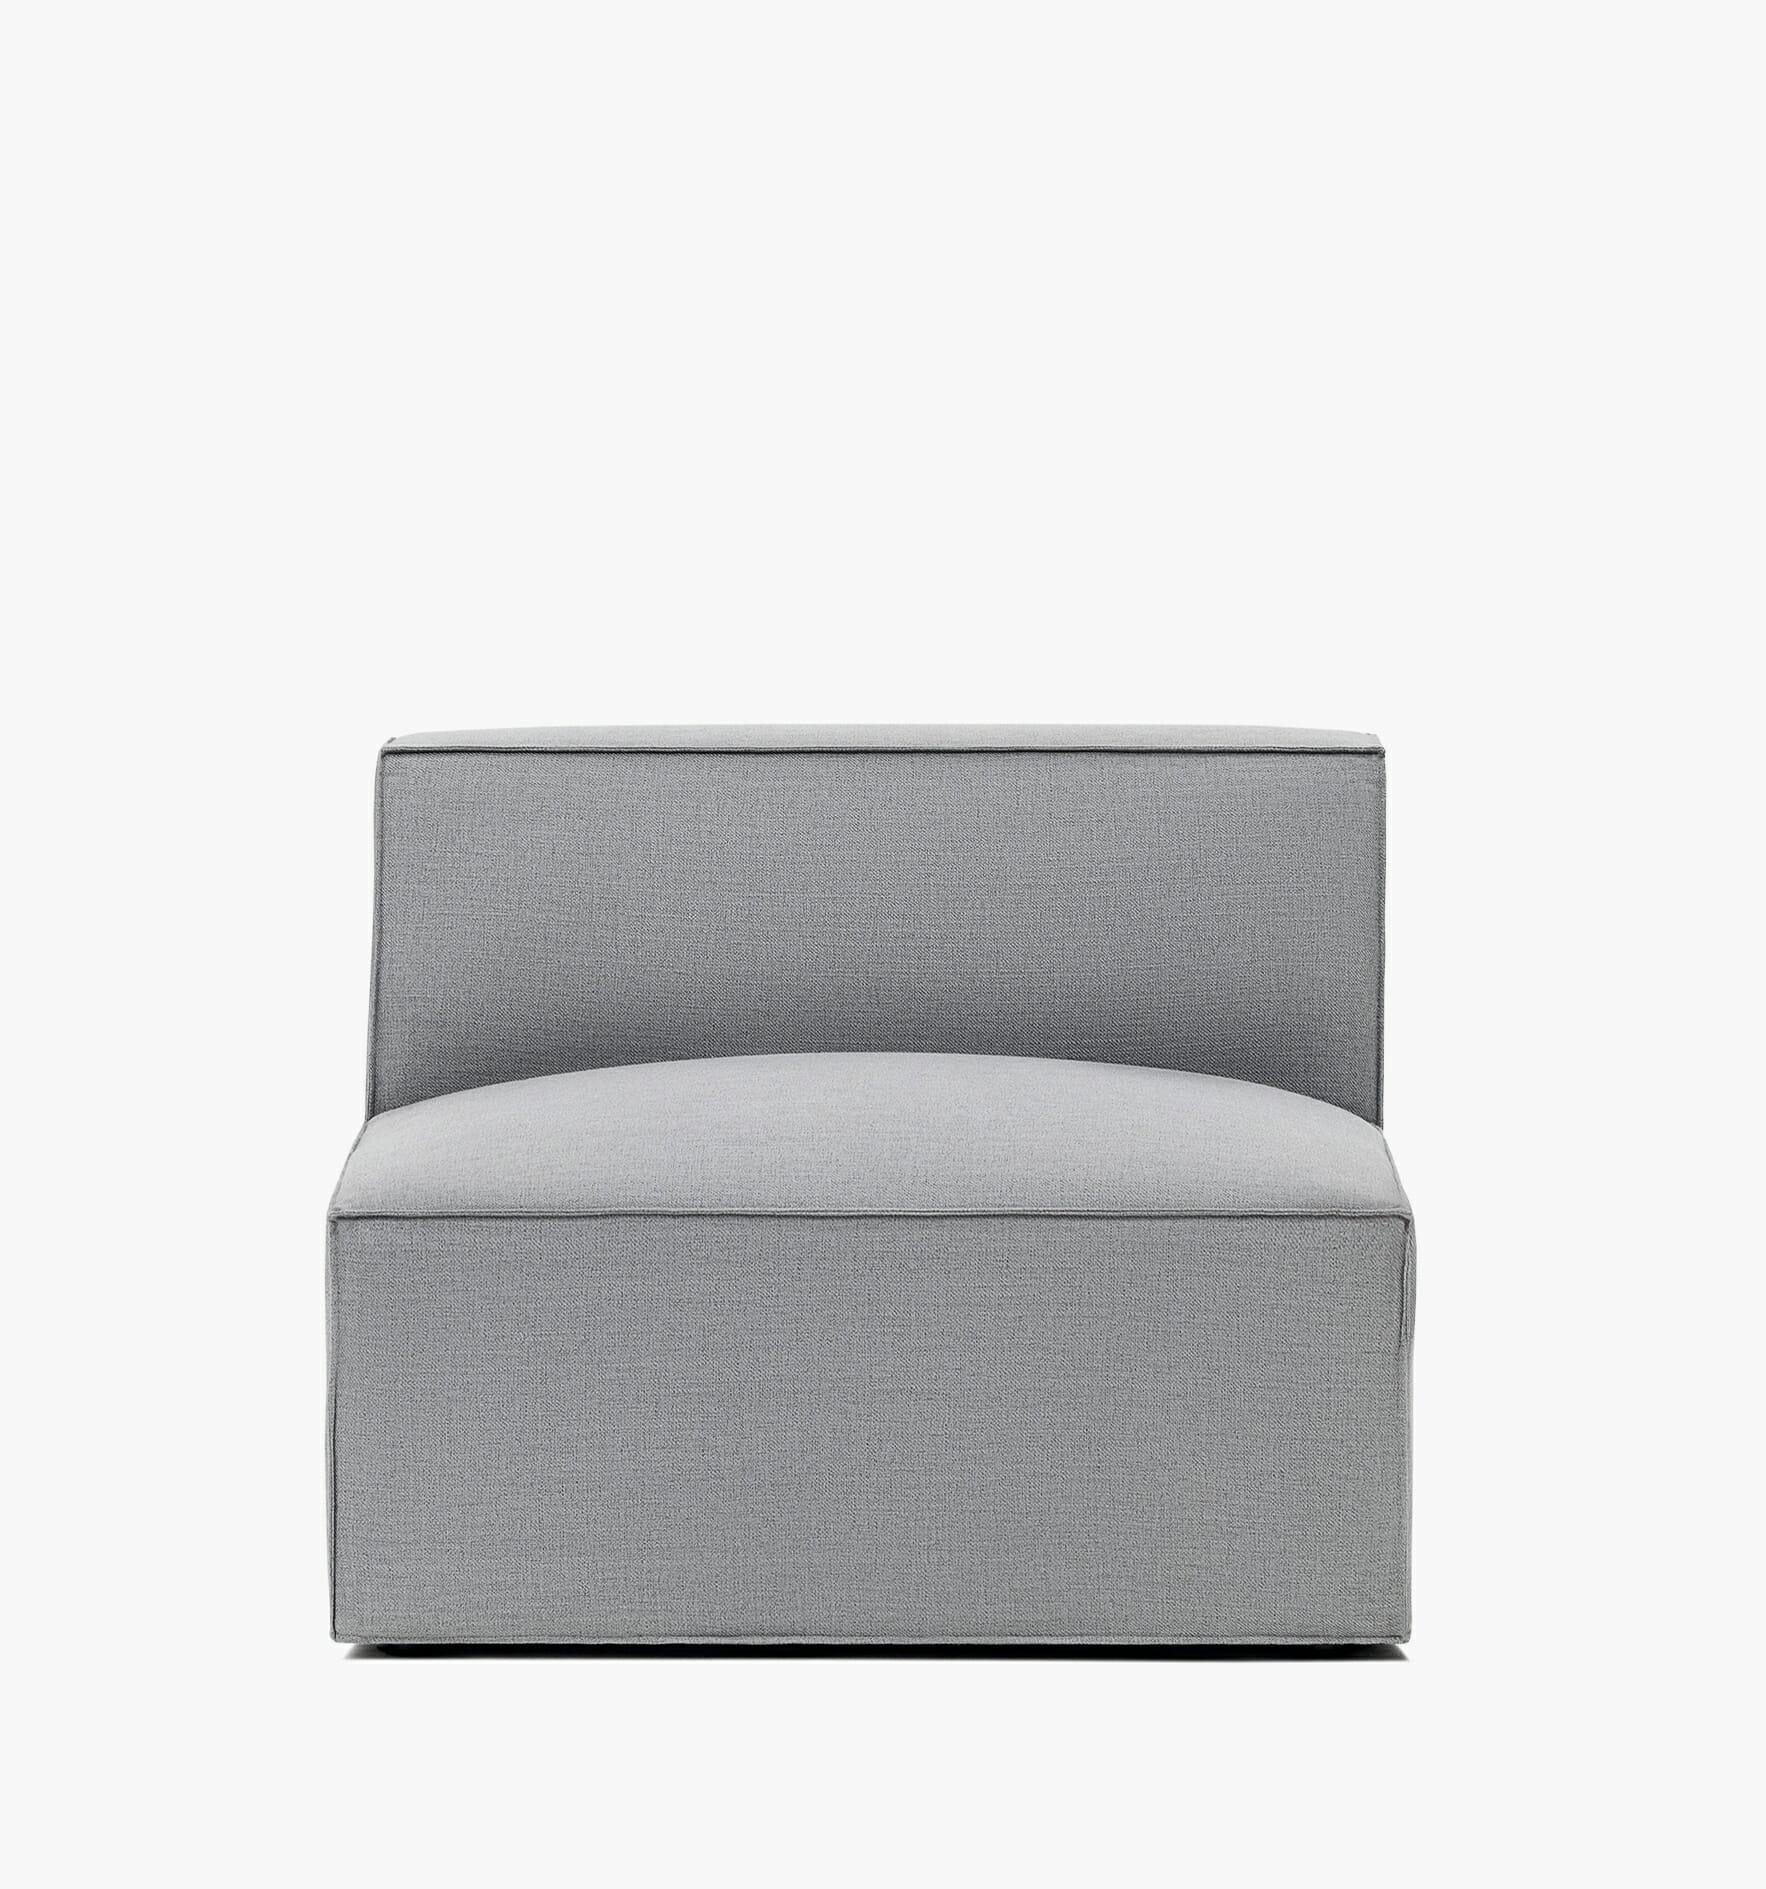 Pacific armless - grey